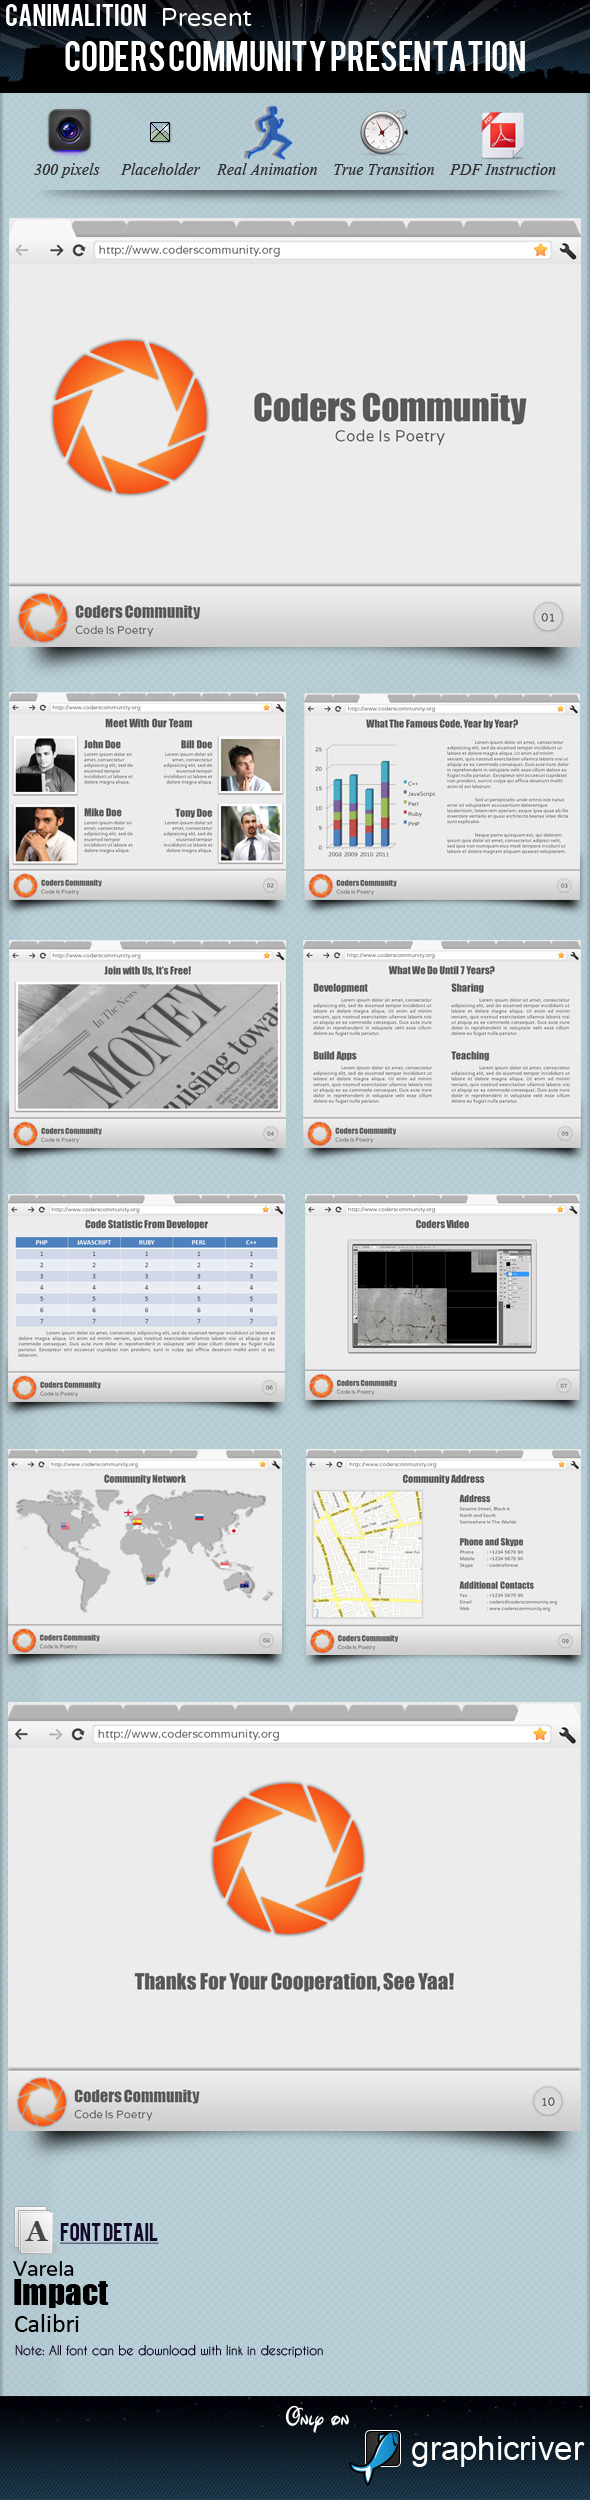 Coders Community Presentation Templates - PowerPoint Templates Presentation Templates